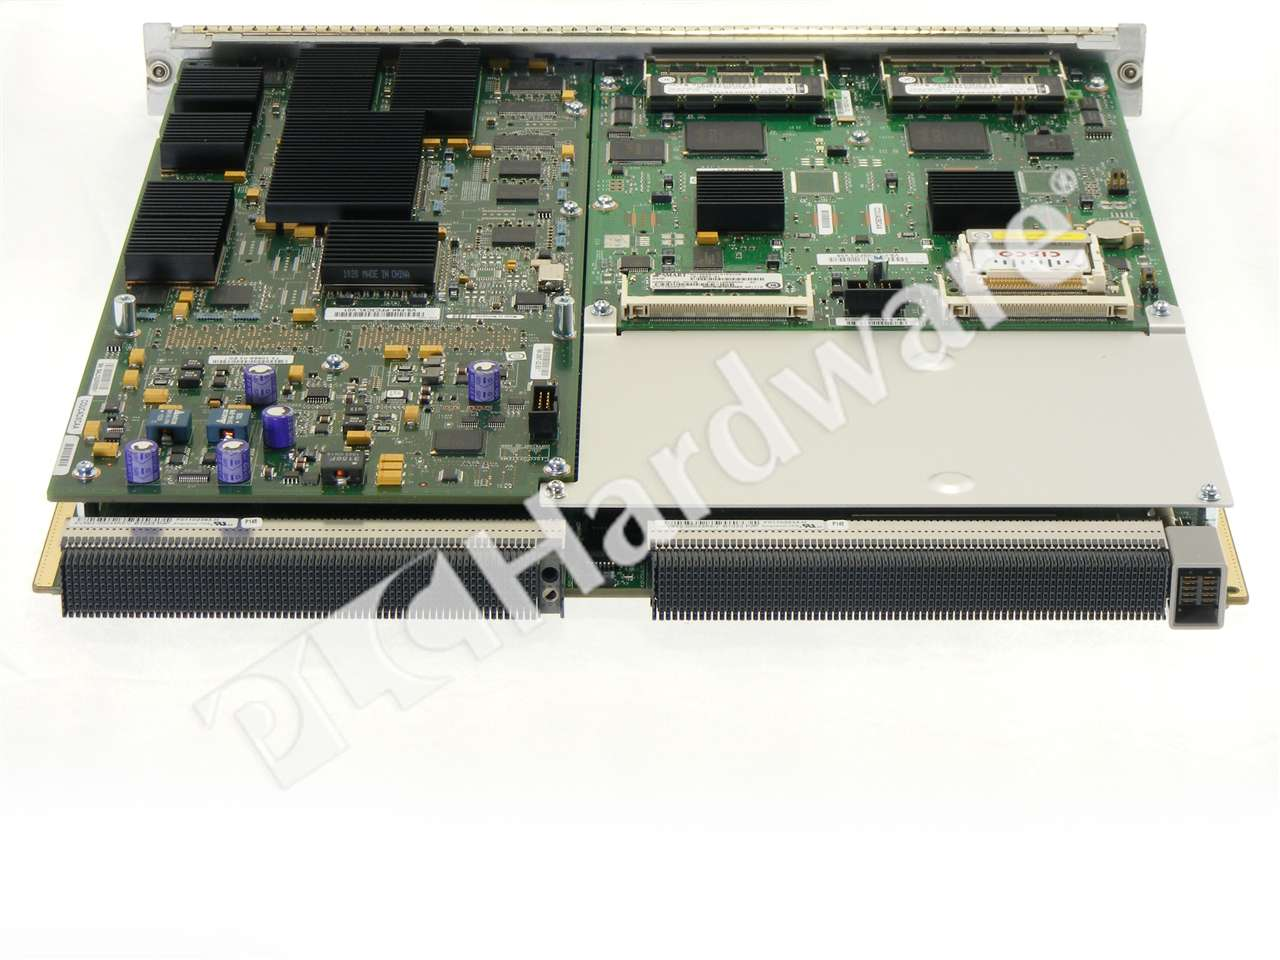 Cisco WS-C6506-E Catalyst 6500 Enhanced 6-slot Chassis,12ru,no Ps,no Fan Tray